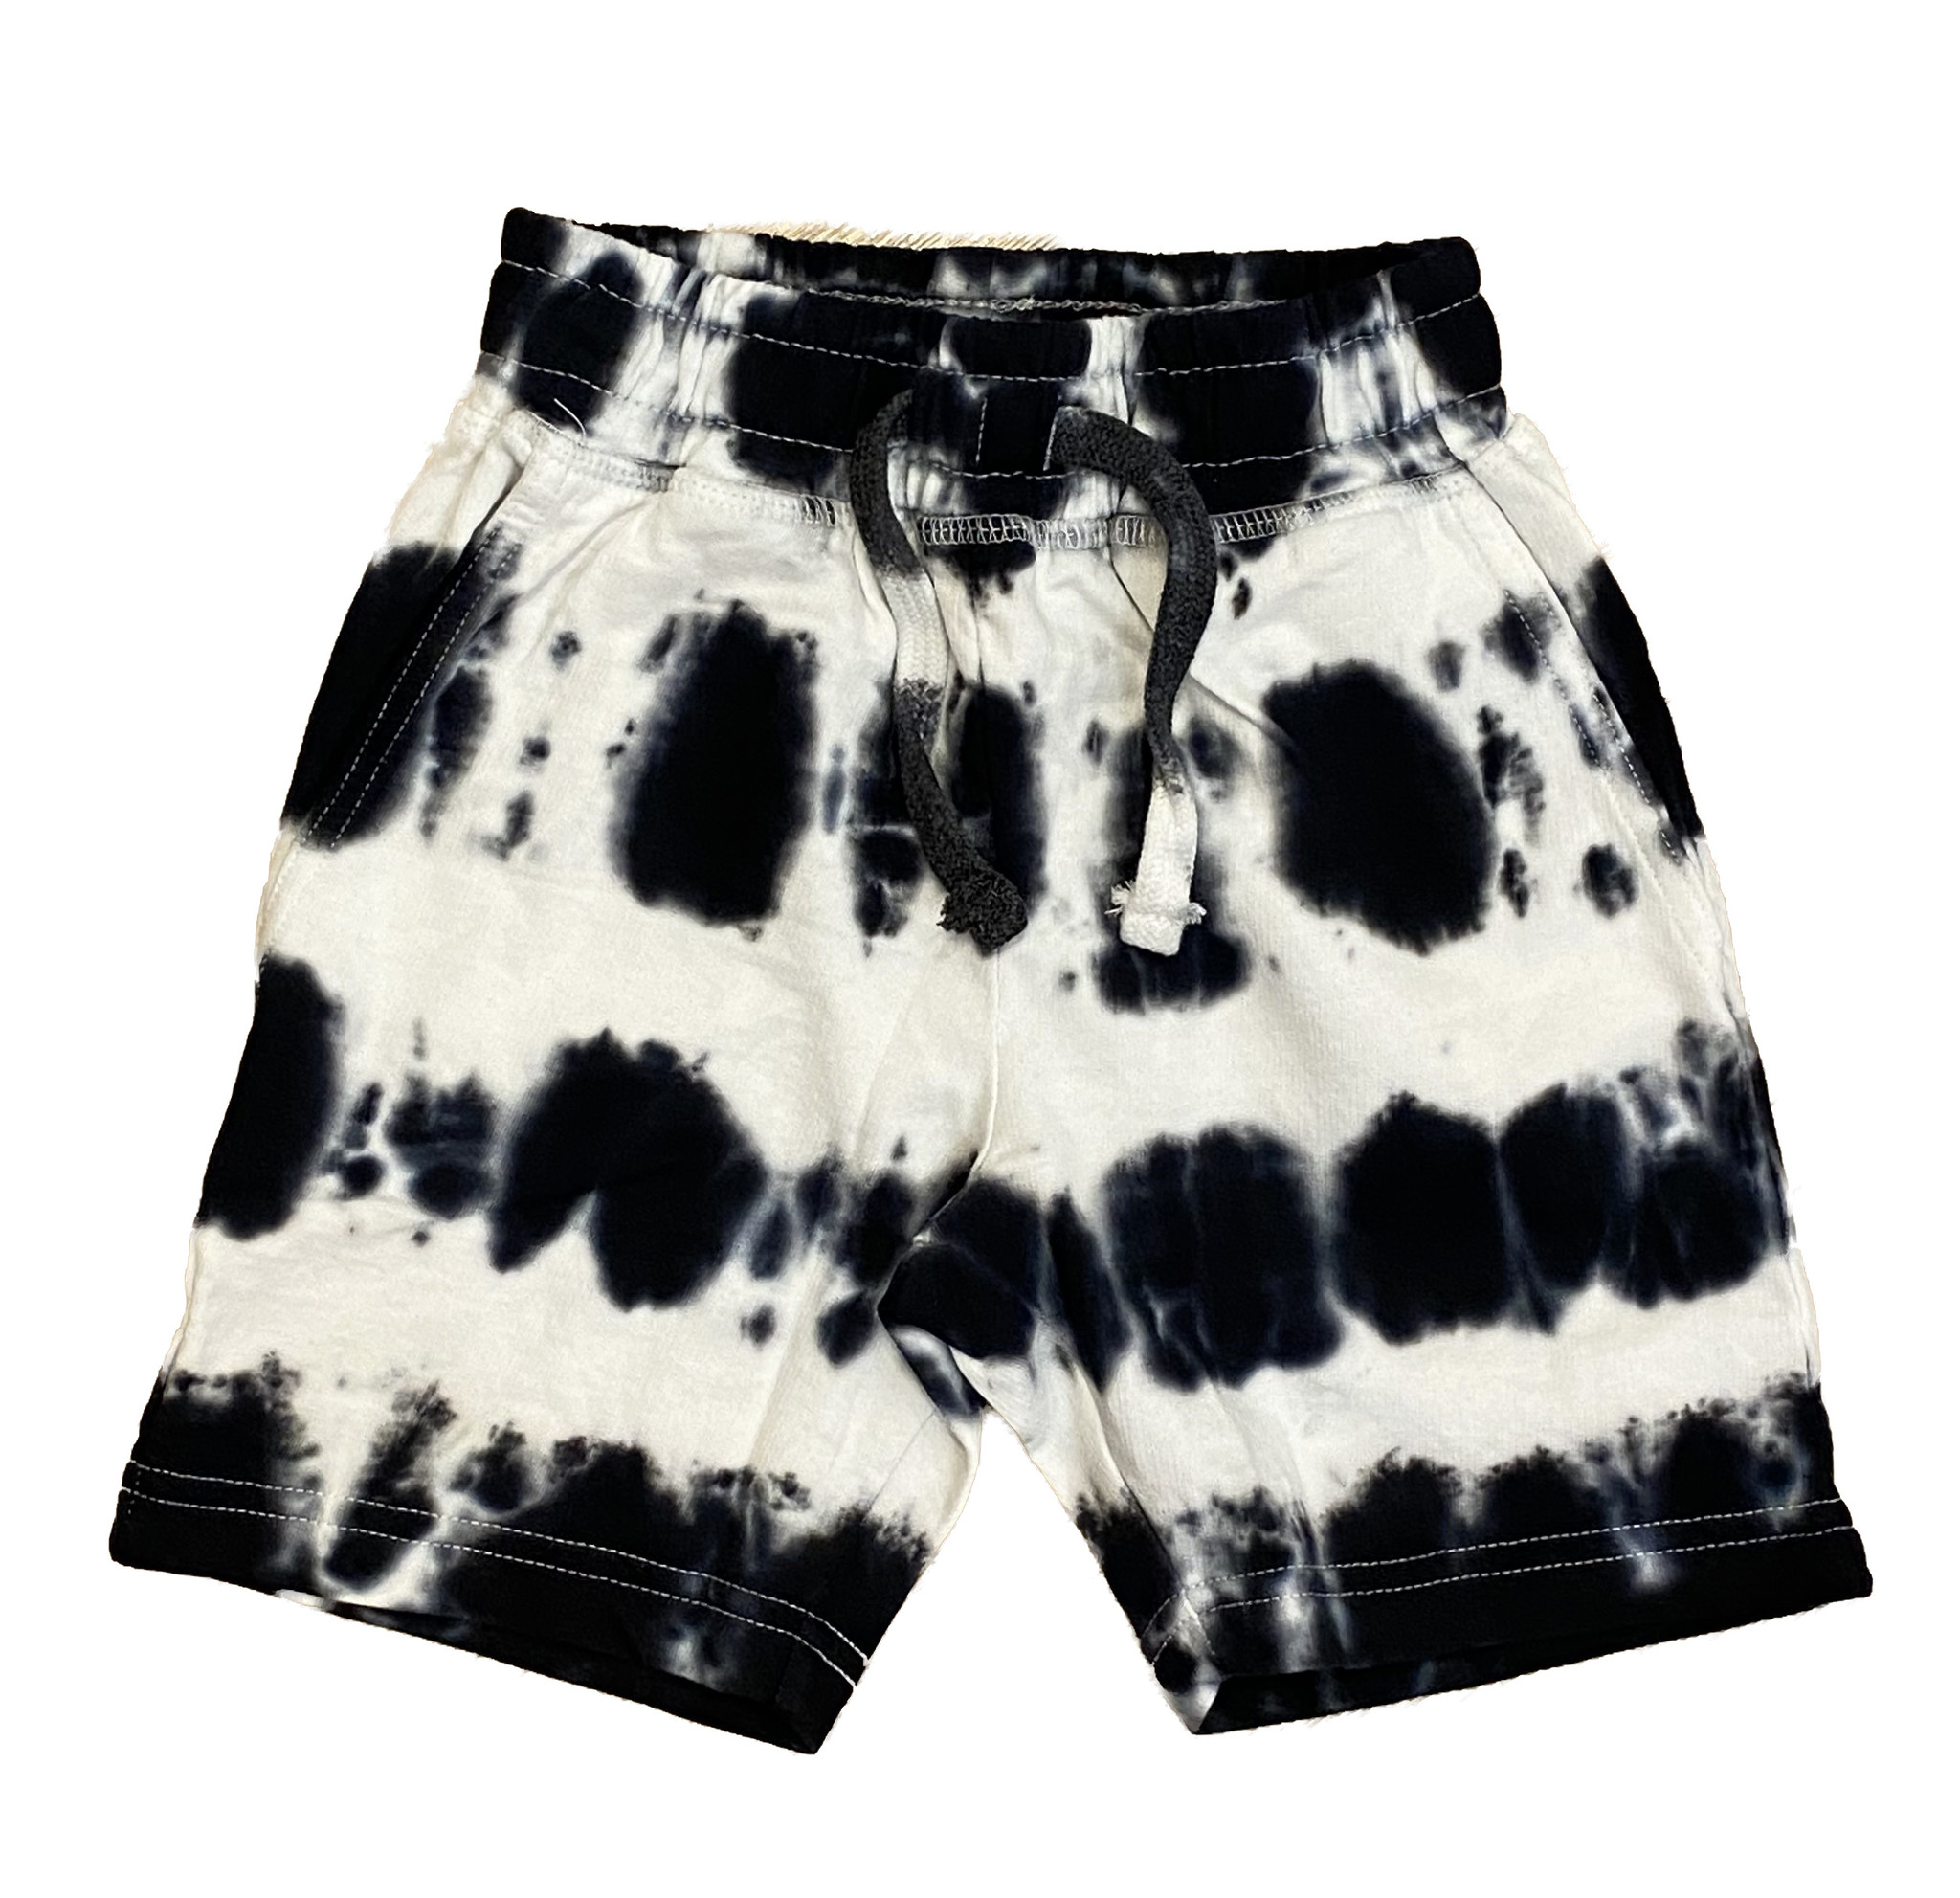 Mish Bryce Blk/Wht TD Infant Shorts